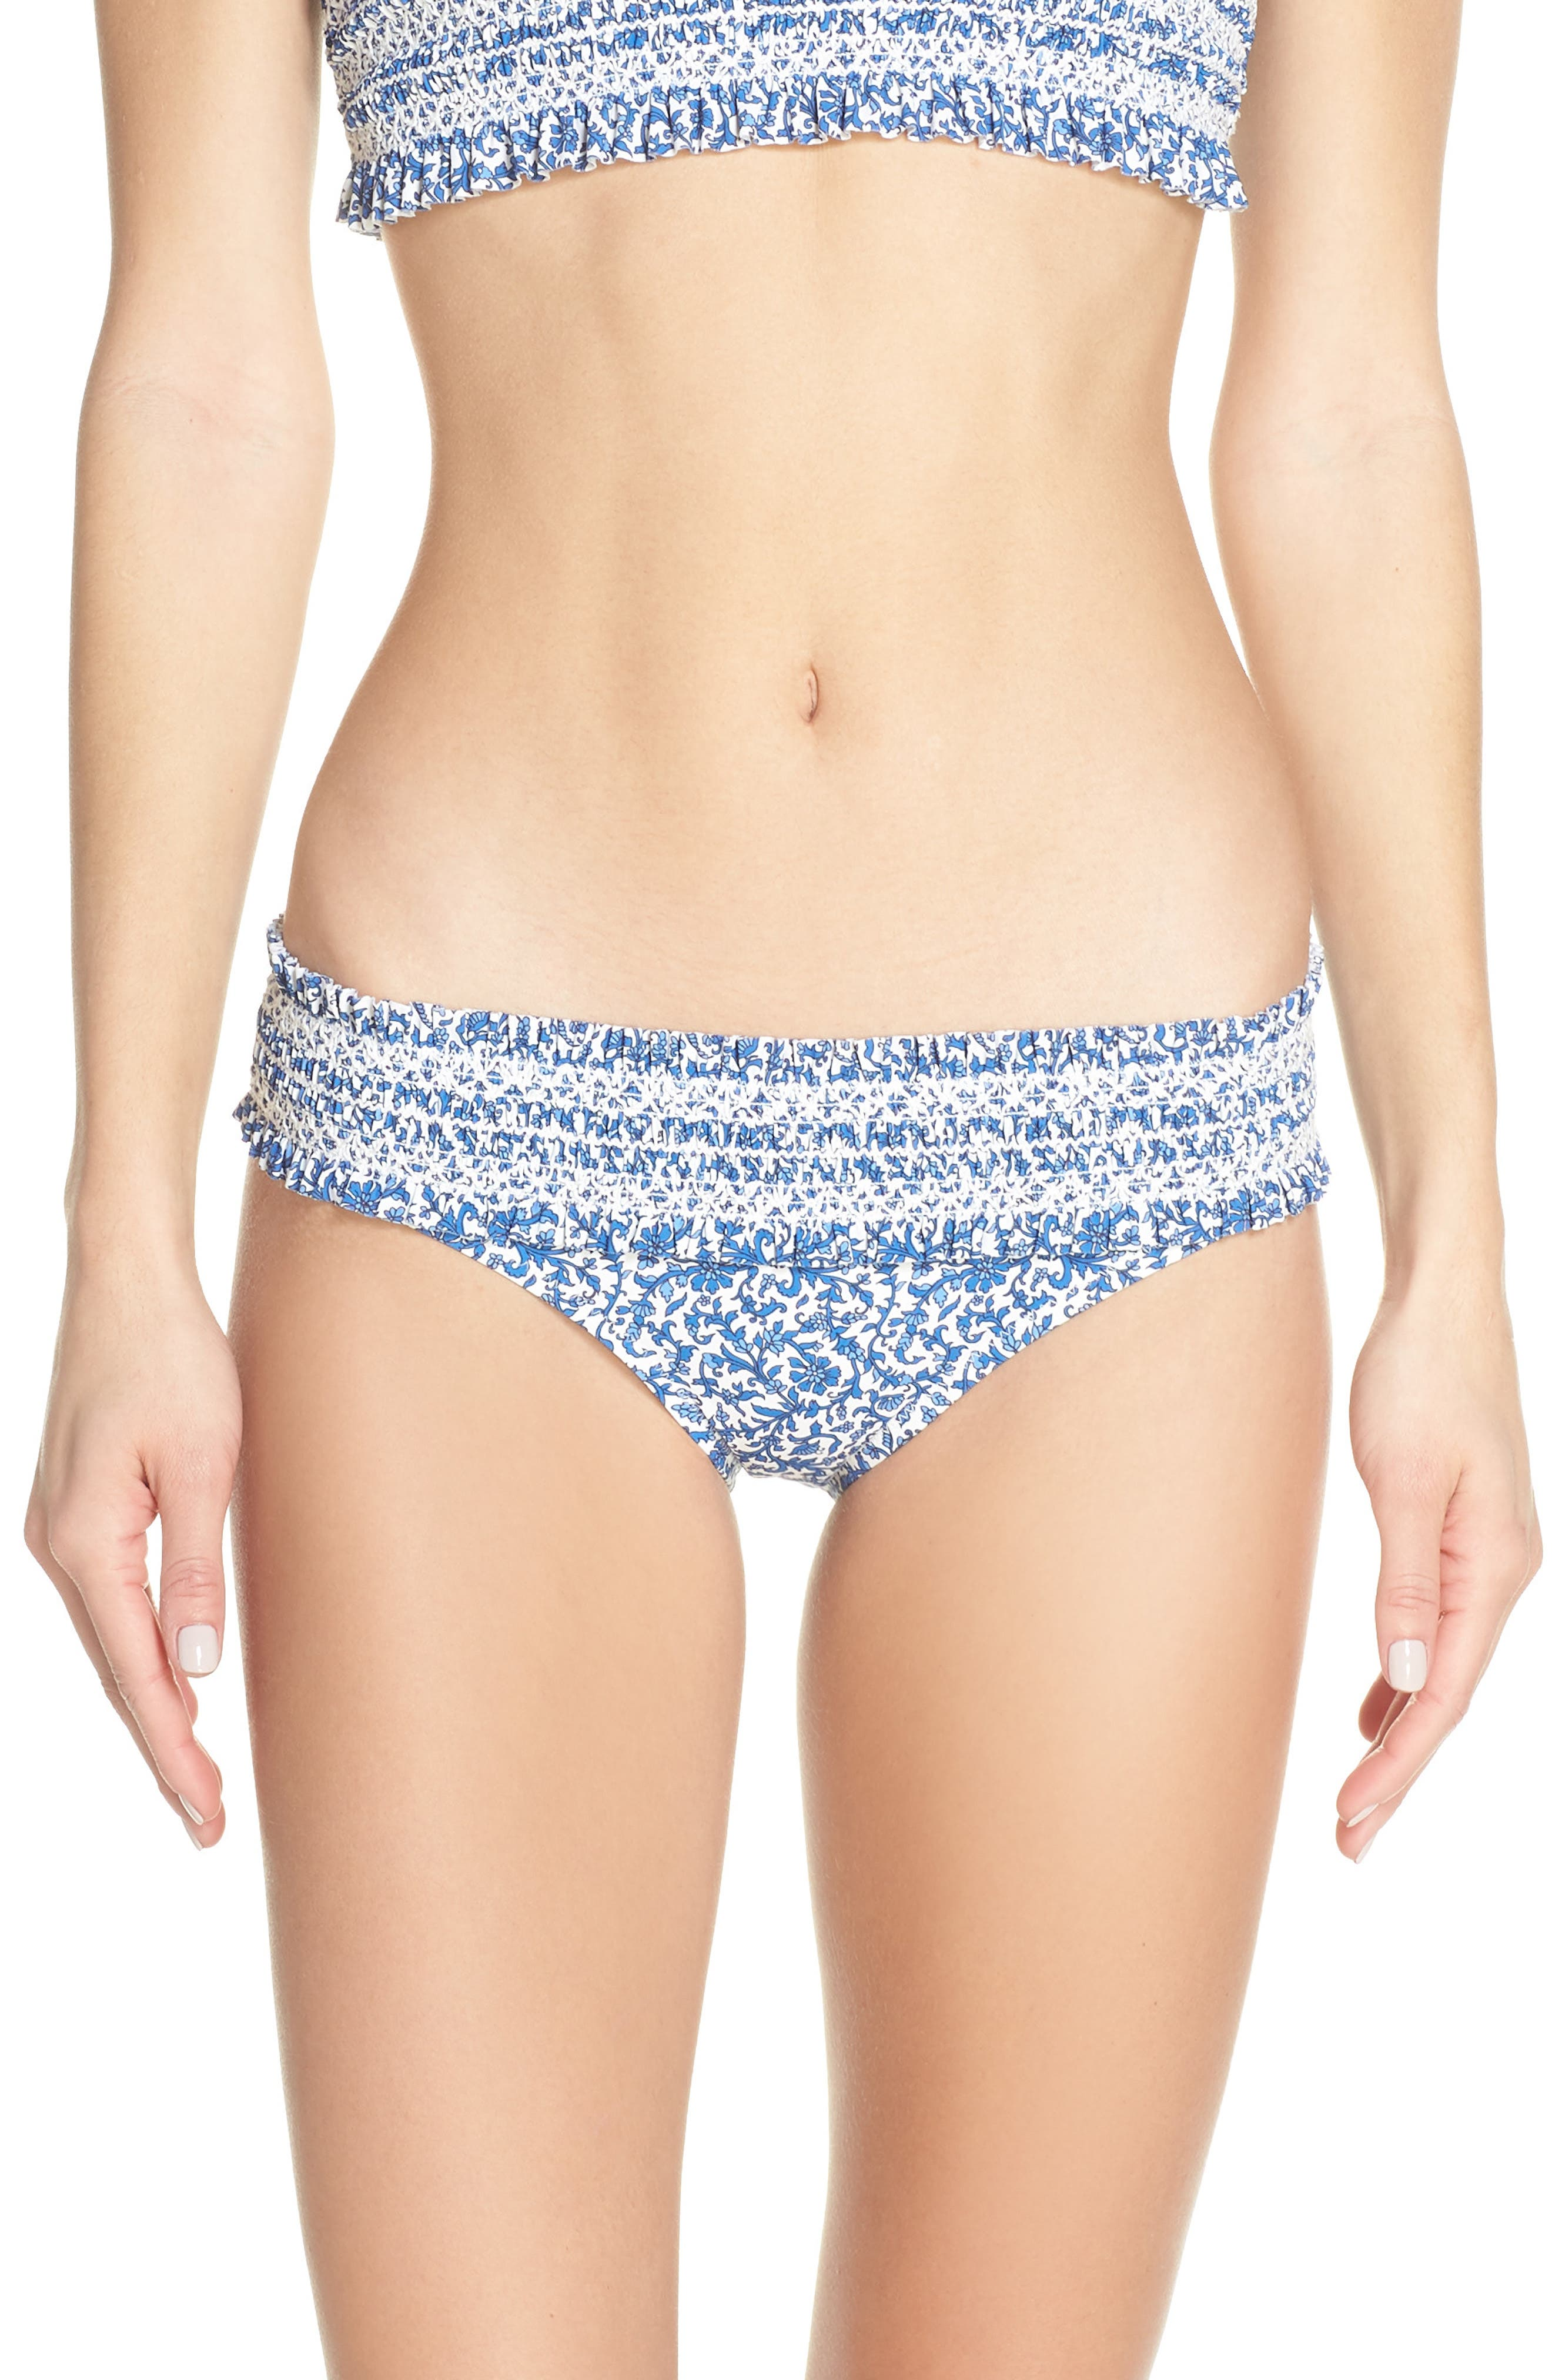 Tory Burch Costa Smocked Bikini Bottoms, Blue